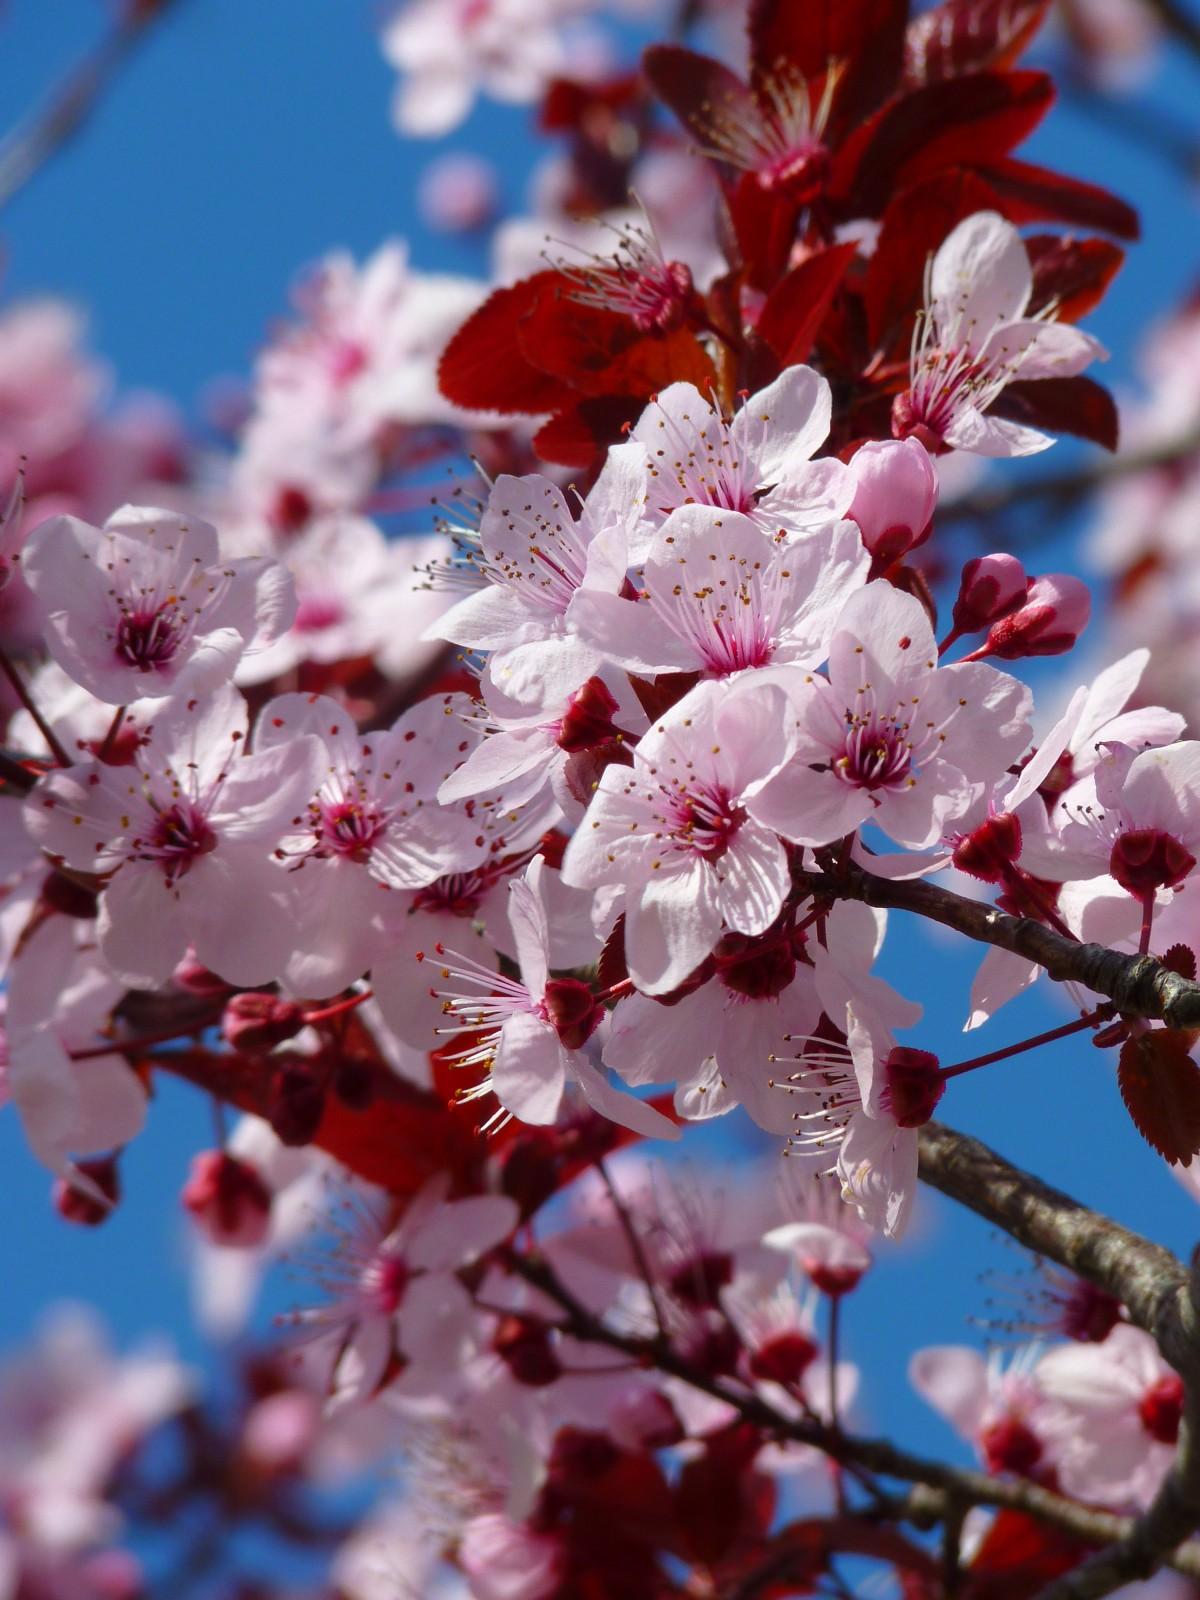 almond_blossom_cherry_blossom_japanese_cherry_trees_blossom_bloom_tree_pink_ornamental_cherry-1157029.jpg!d